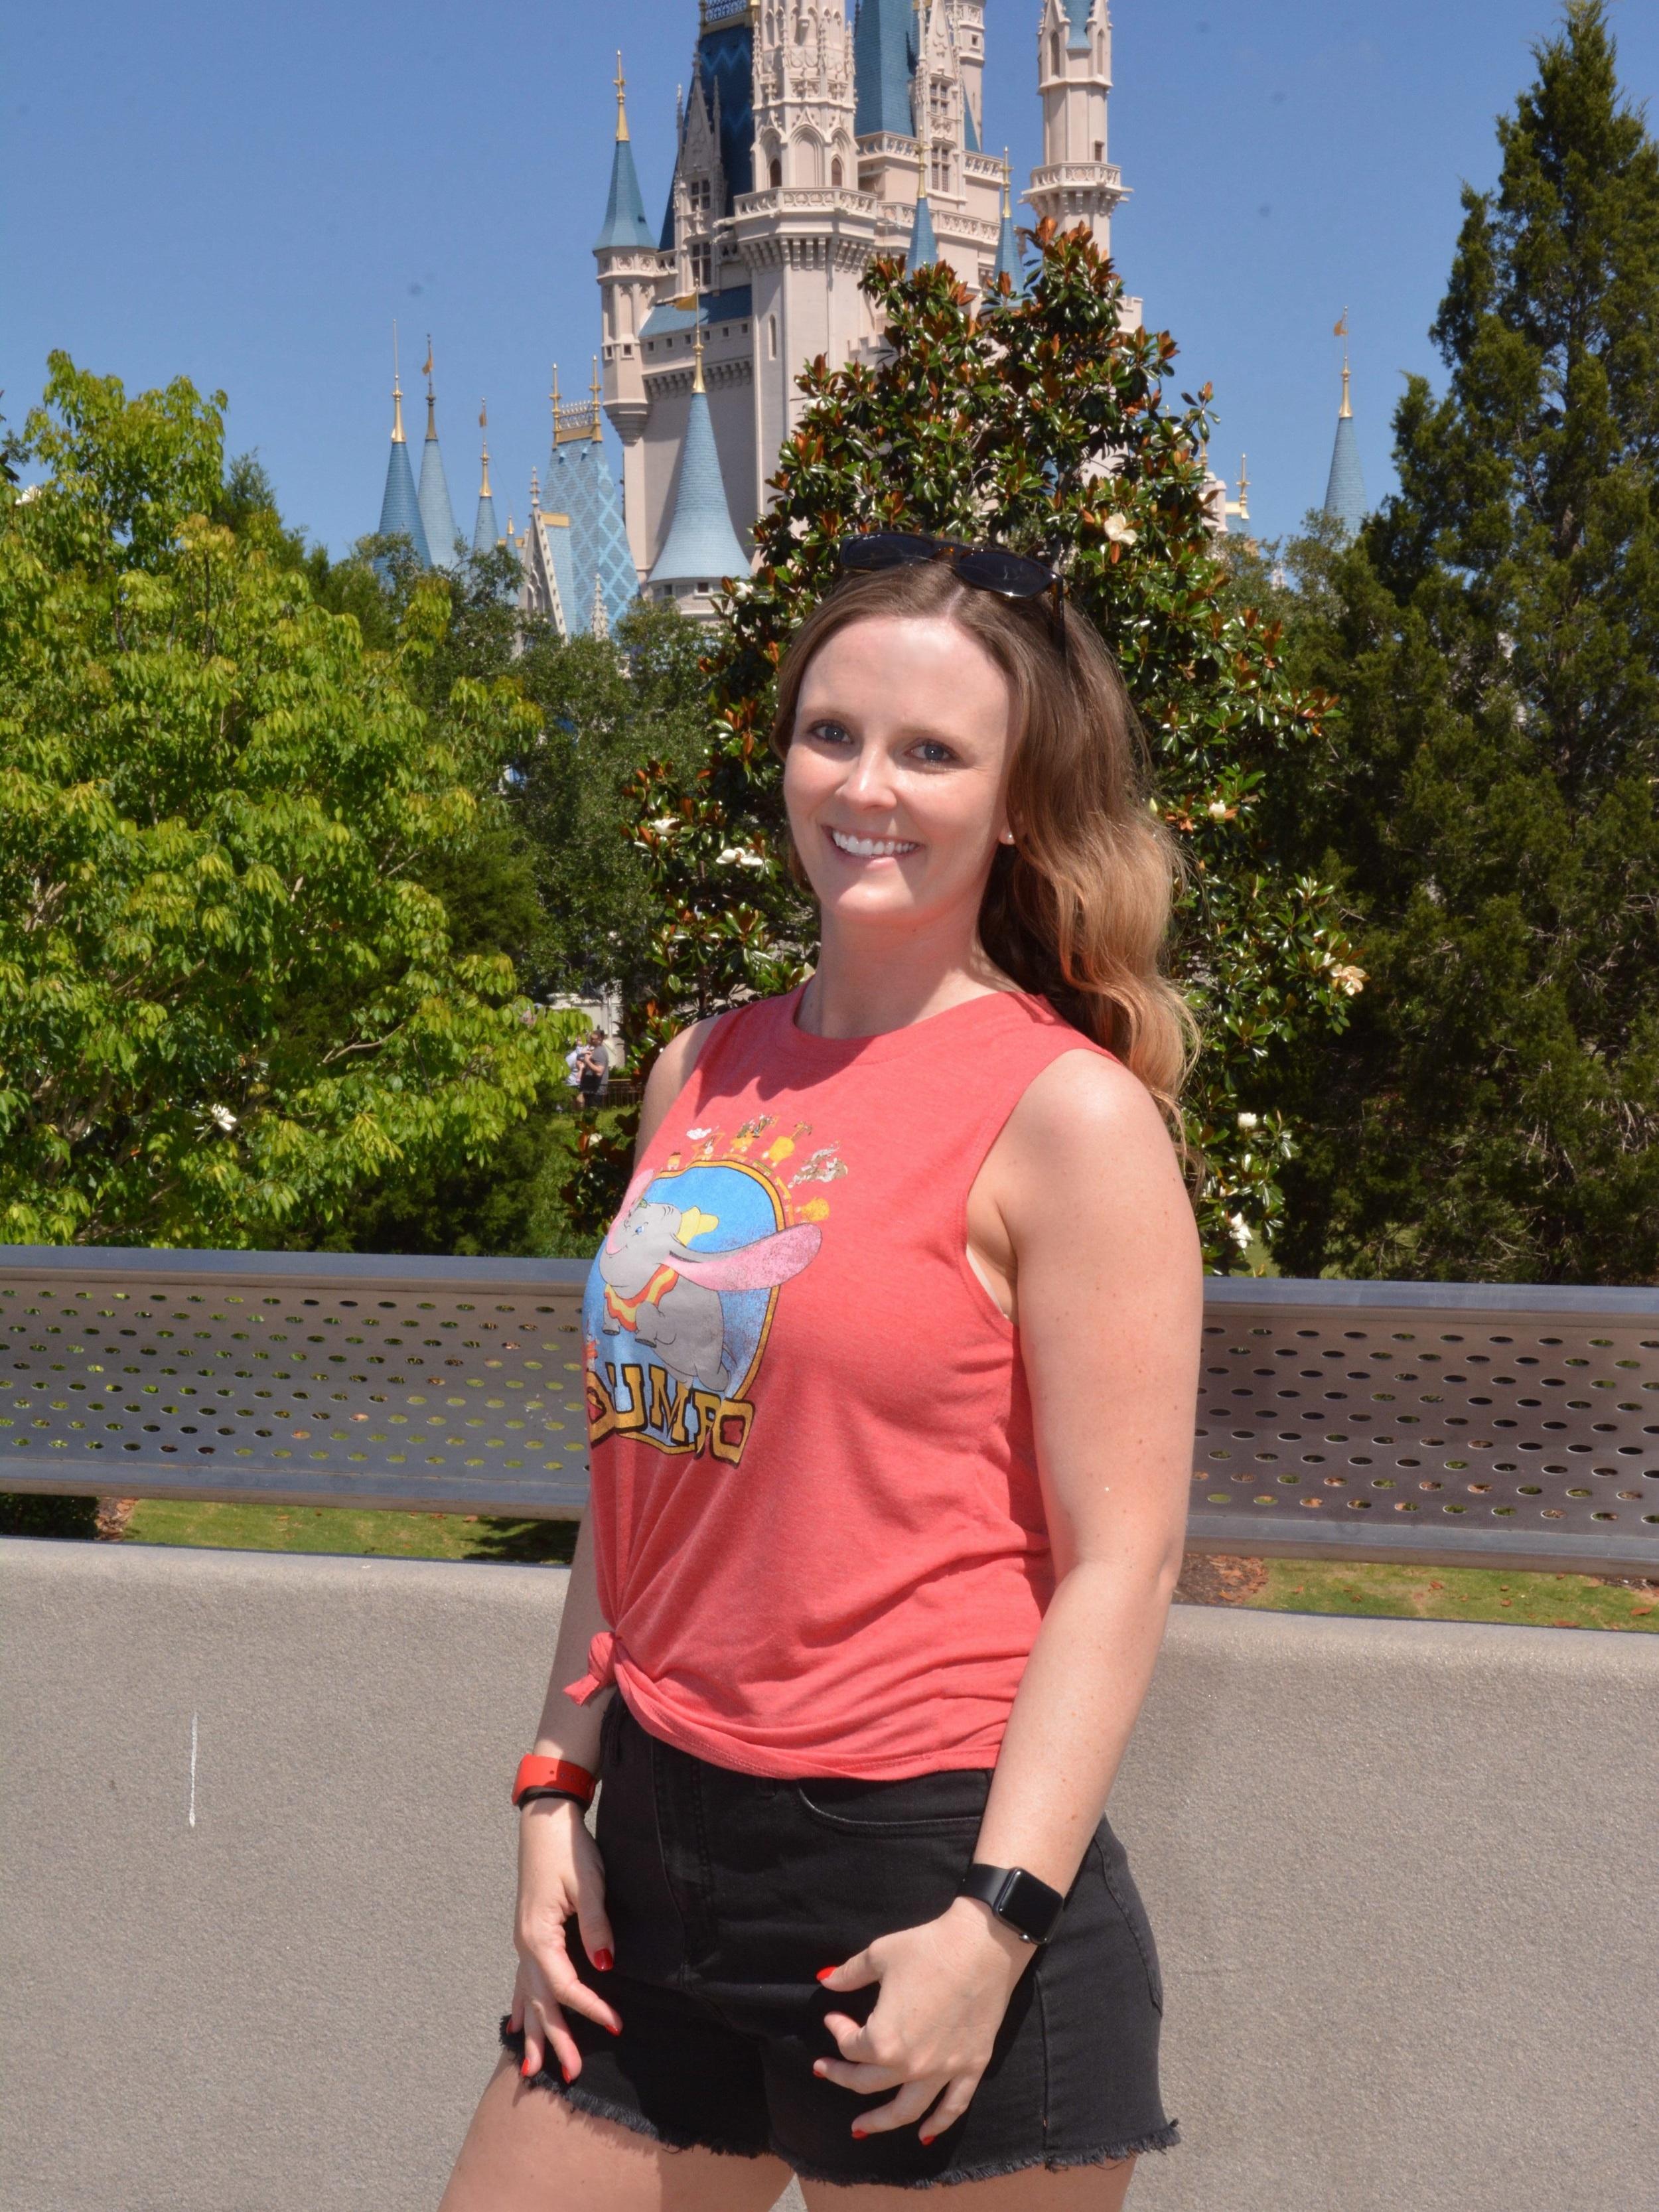 Elise Bruns, Agent | elise@spiritofadventuretravel.com  Elise is an Agent in Kansas City specializing in Disney Destinations